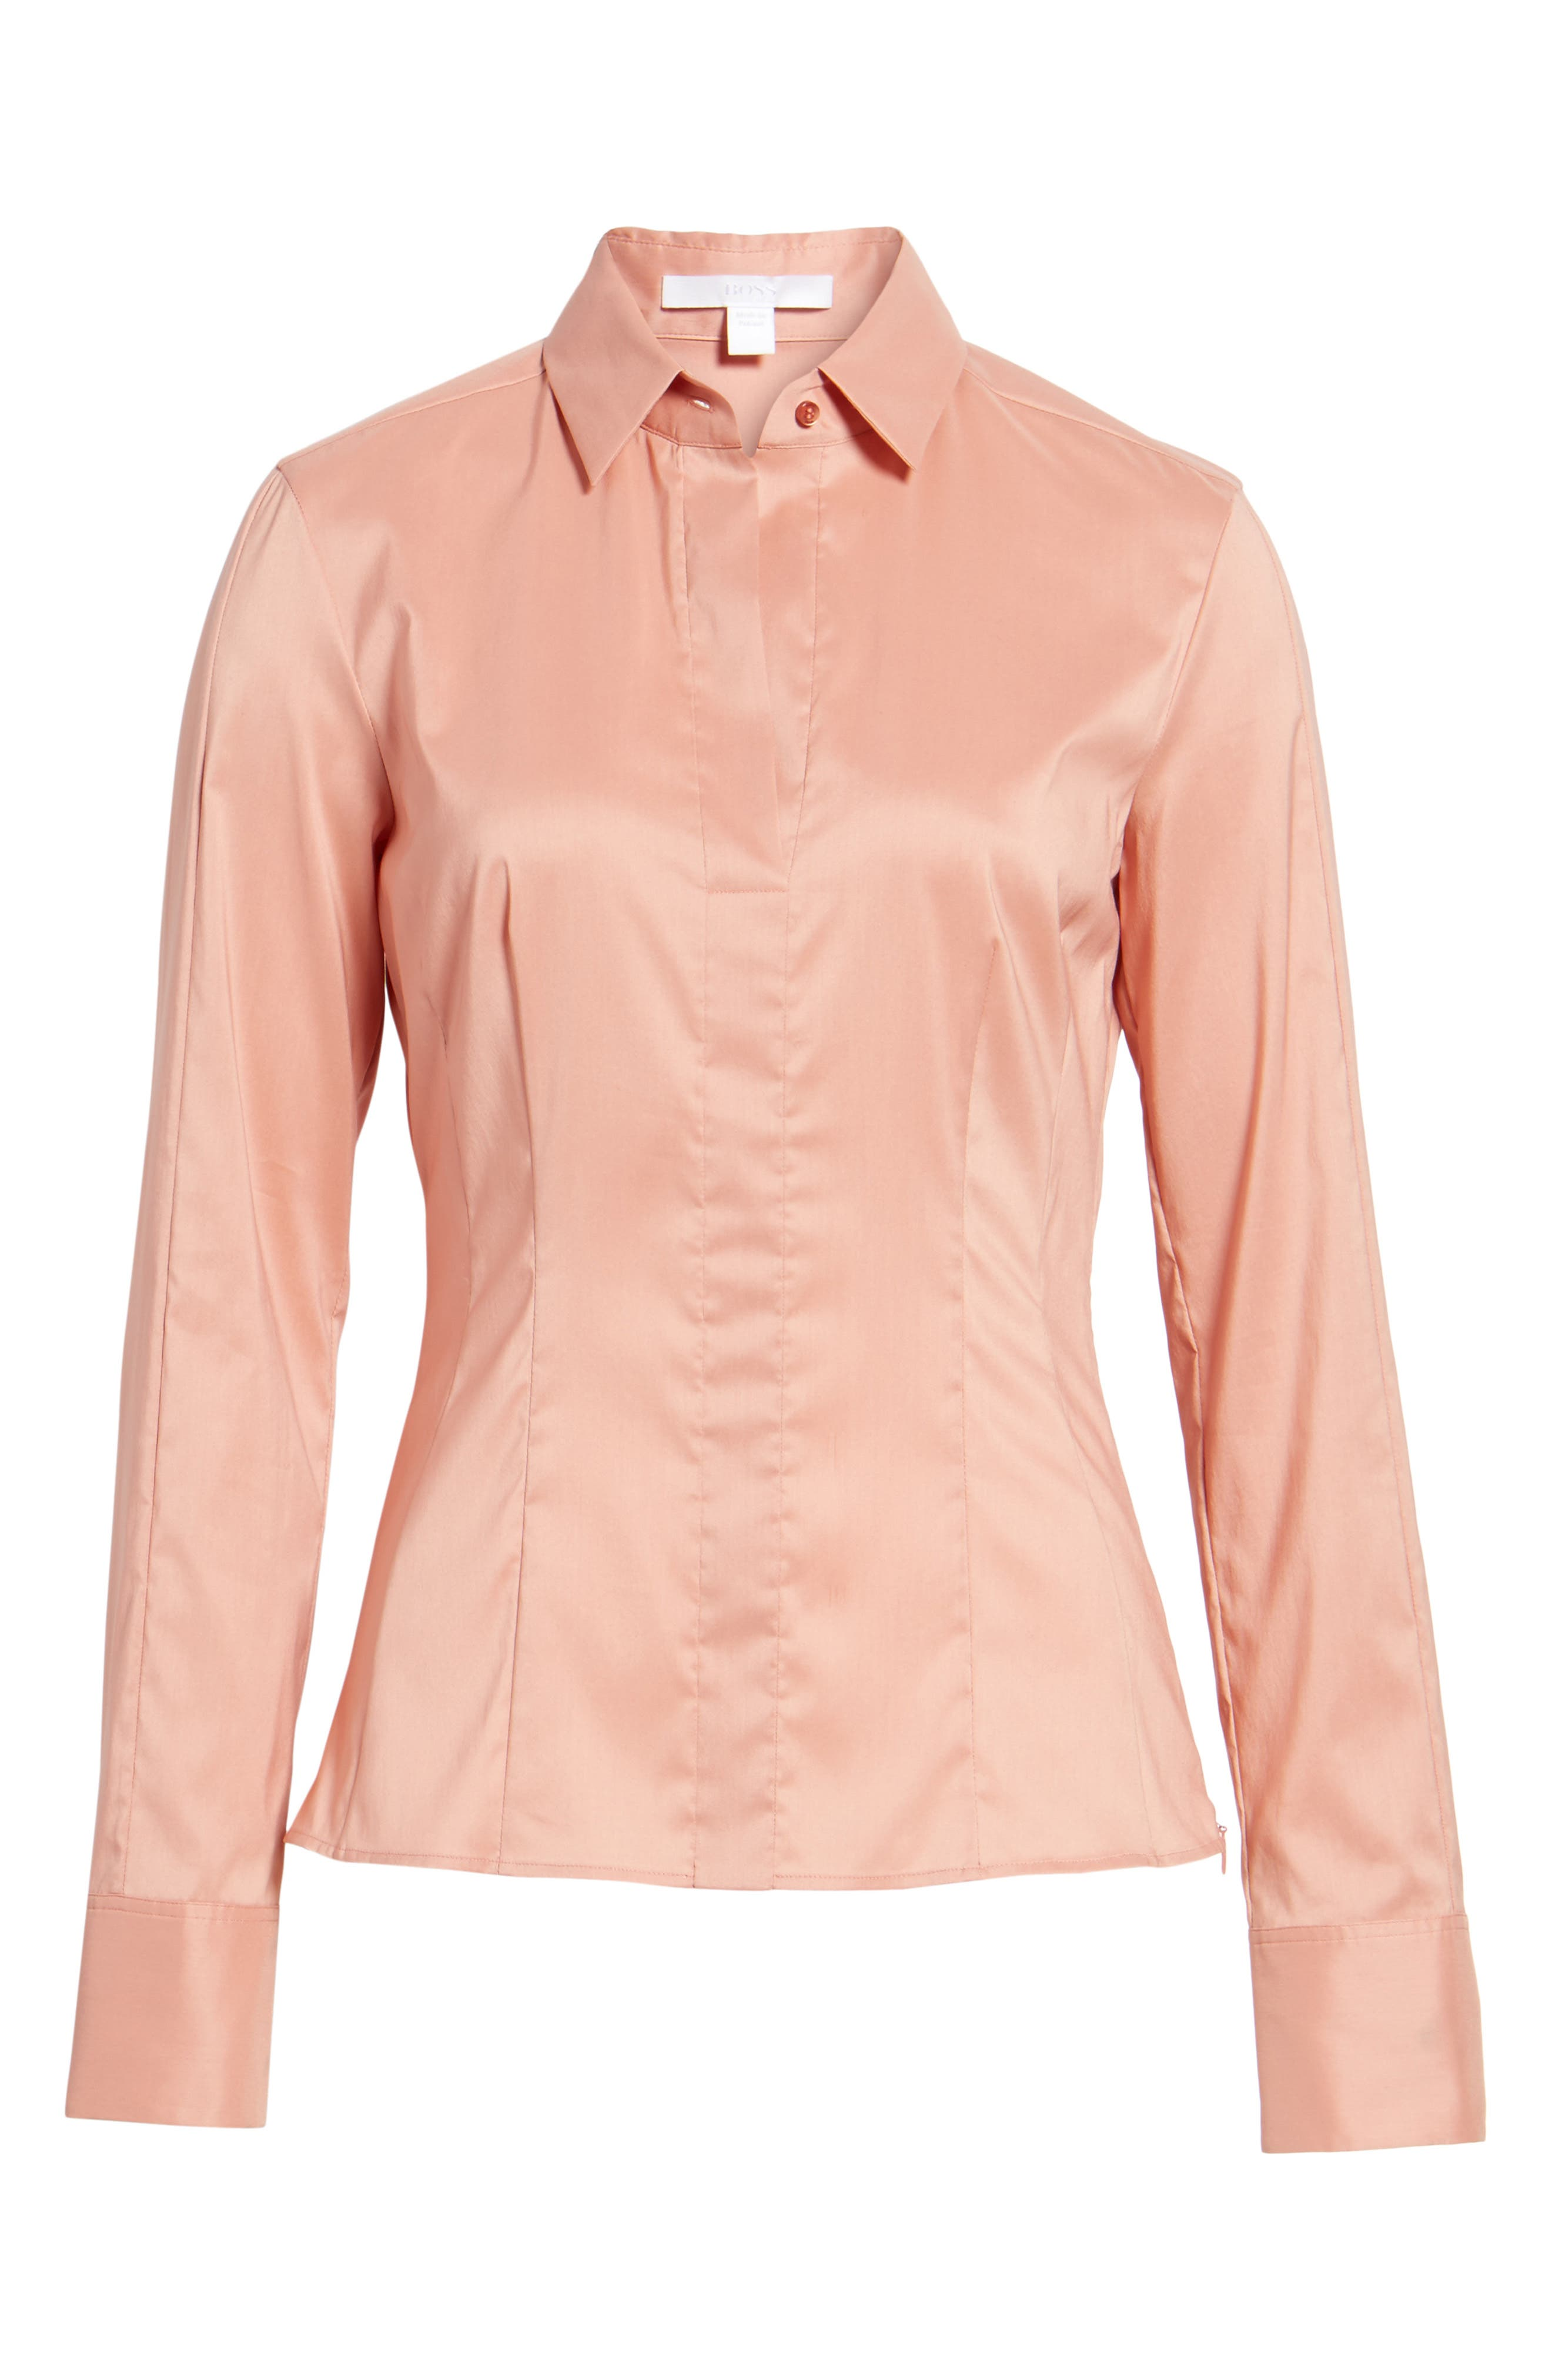 Bashina Fitted Stretch Poplin Shirt,                             Alternate thumbnail 6, color,                             Sand Rose